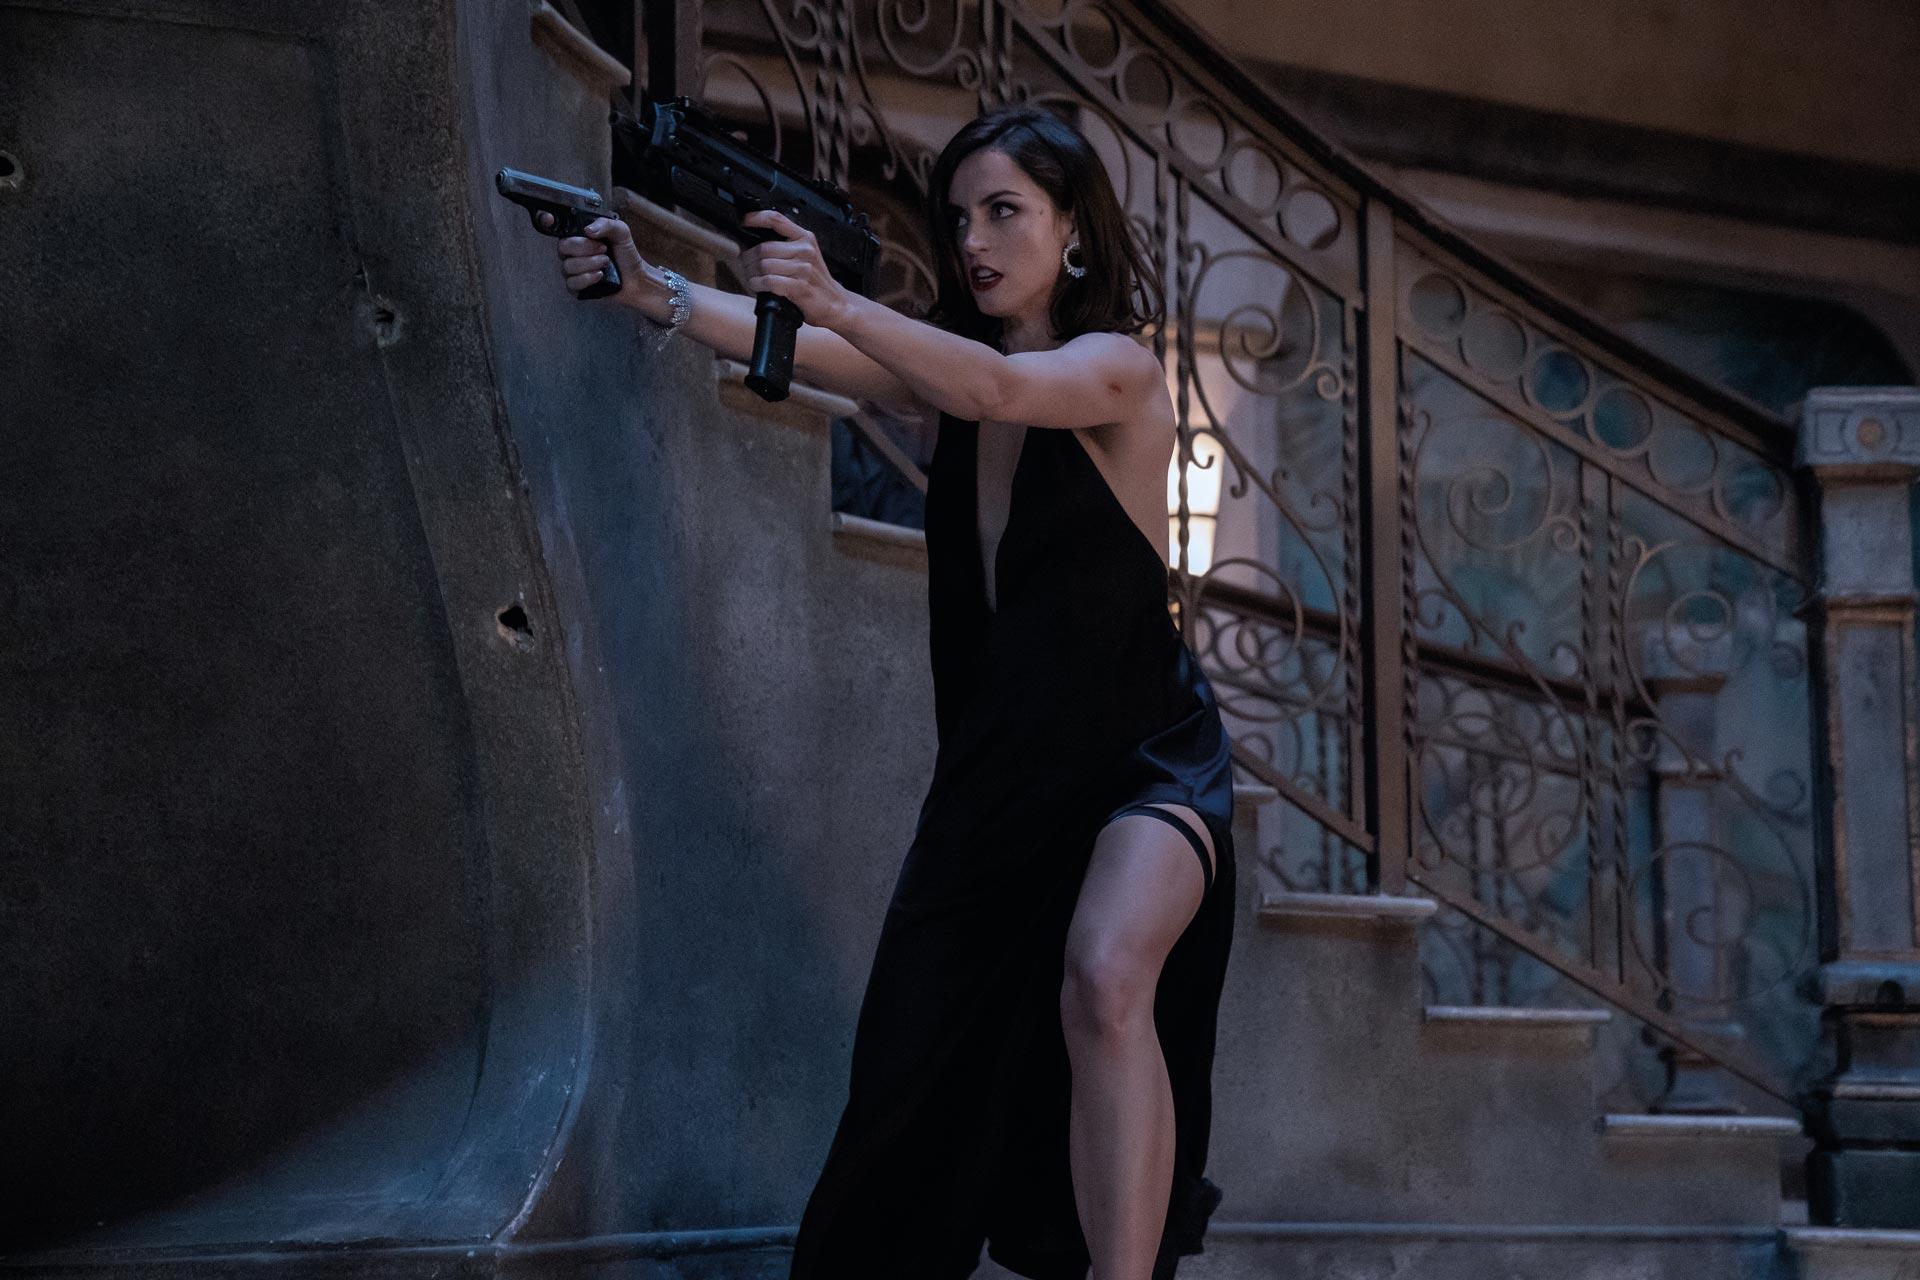 Bond Girl, l'evoluzione